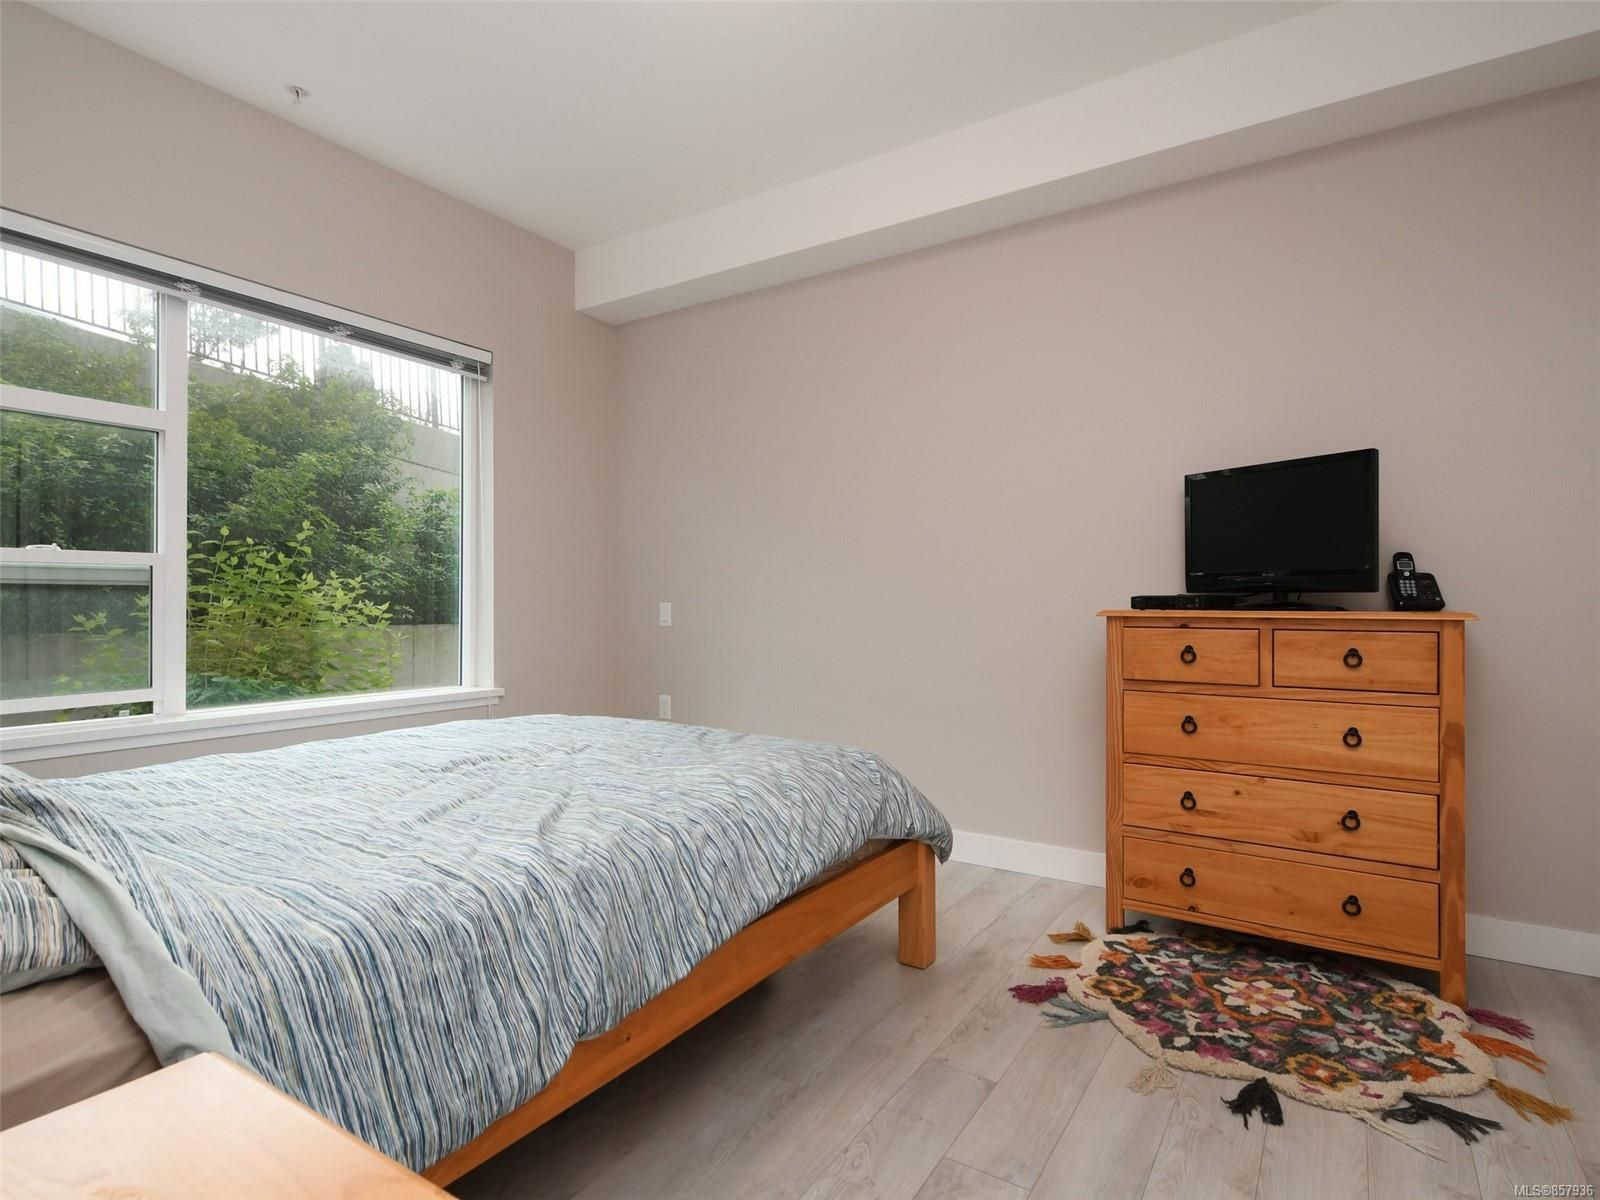 Photo 11: Photos: 103 1020 Inverness Rd in Saanich: SE Quadra Condo for sale (Saanich East)  : MLS®# 857936